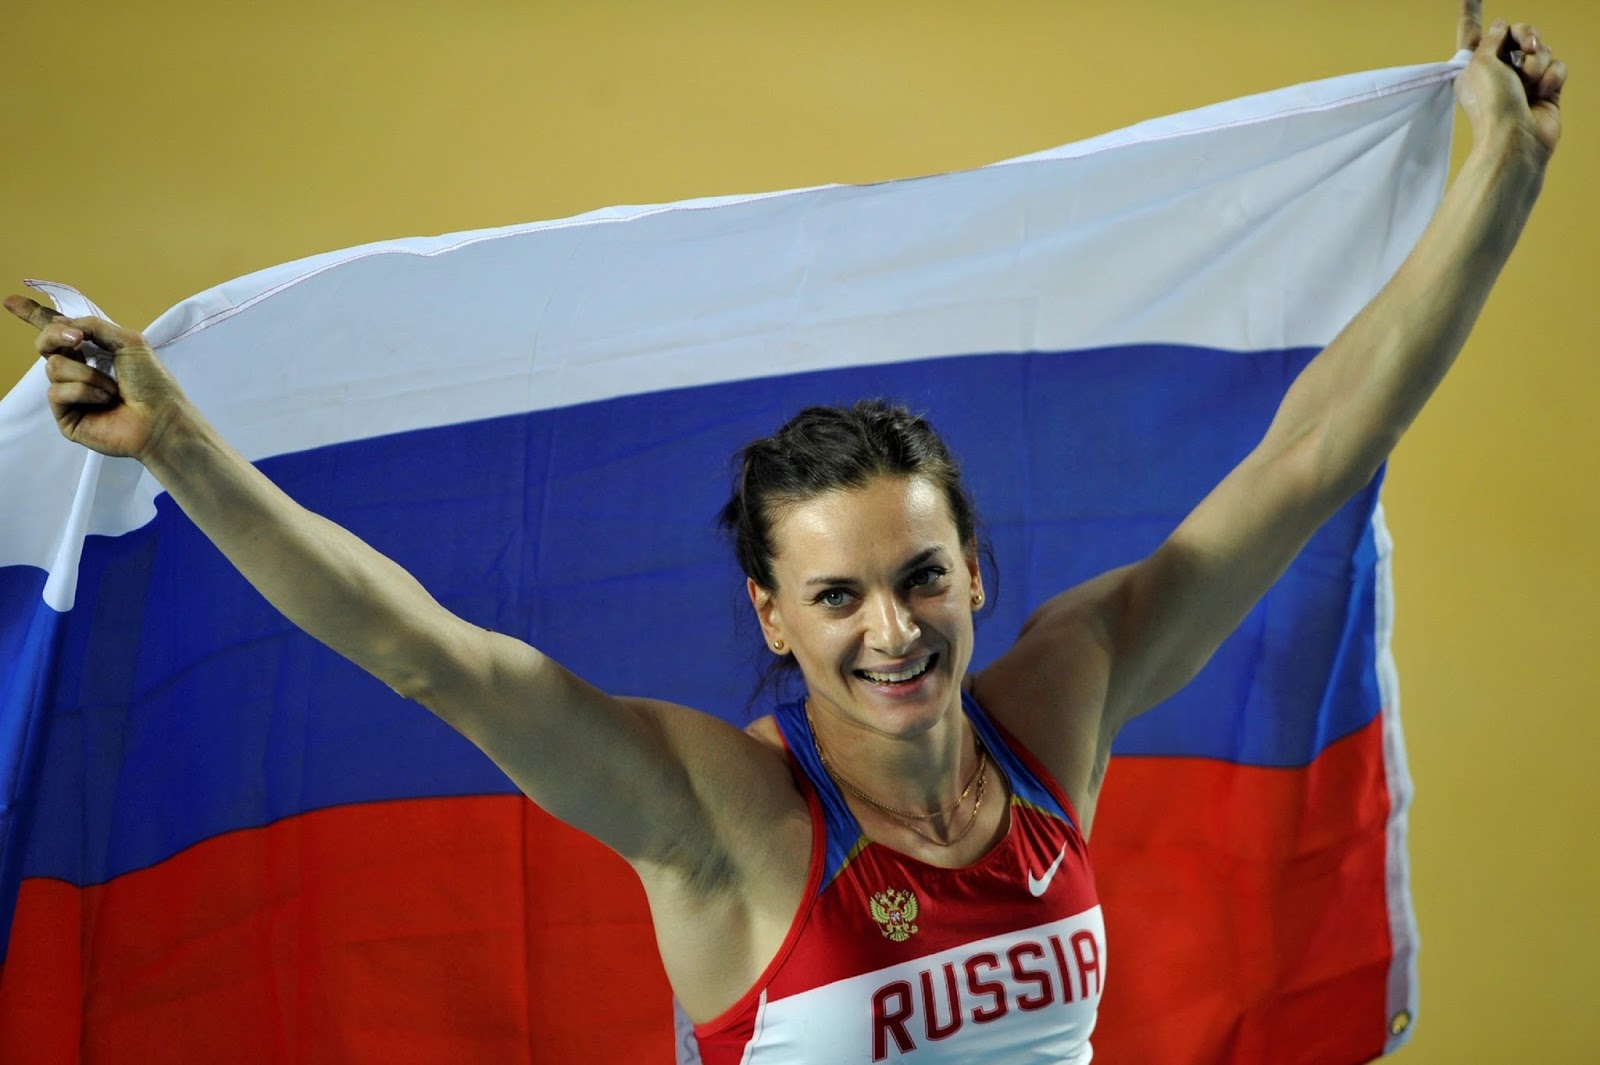 RUSSIA 2016 RIO OLYMPICS 9